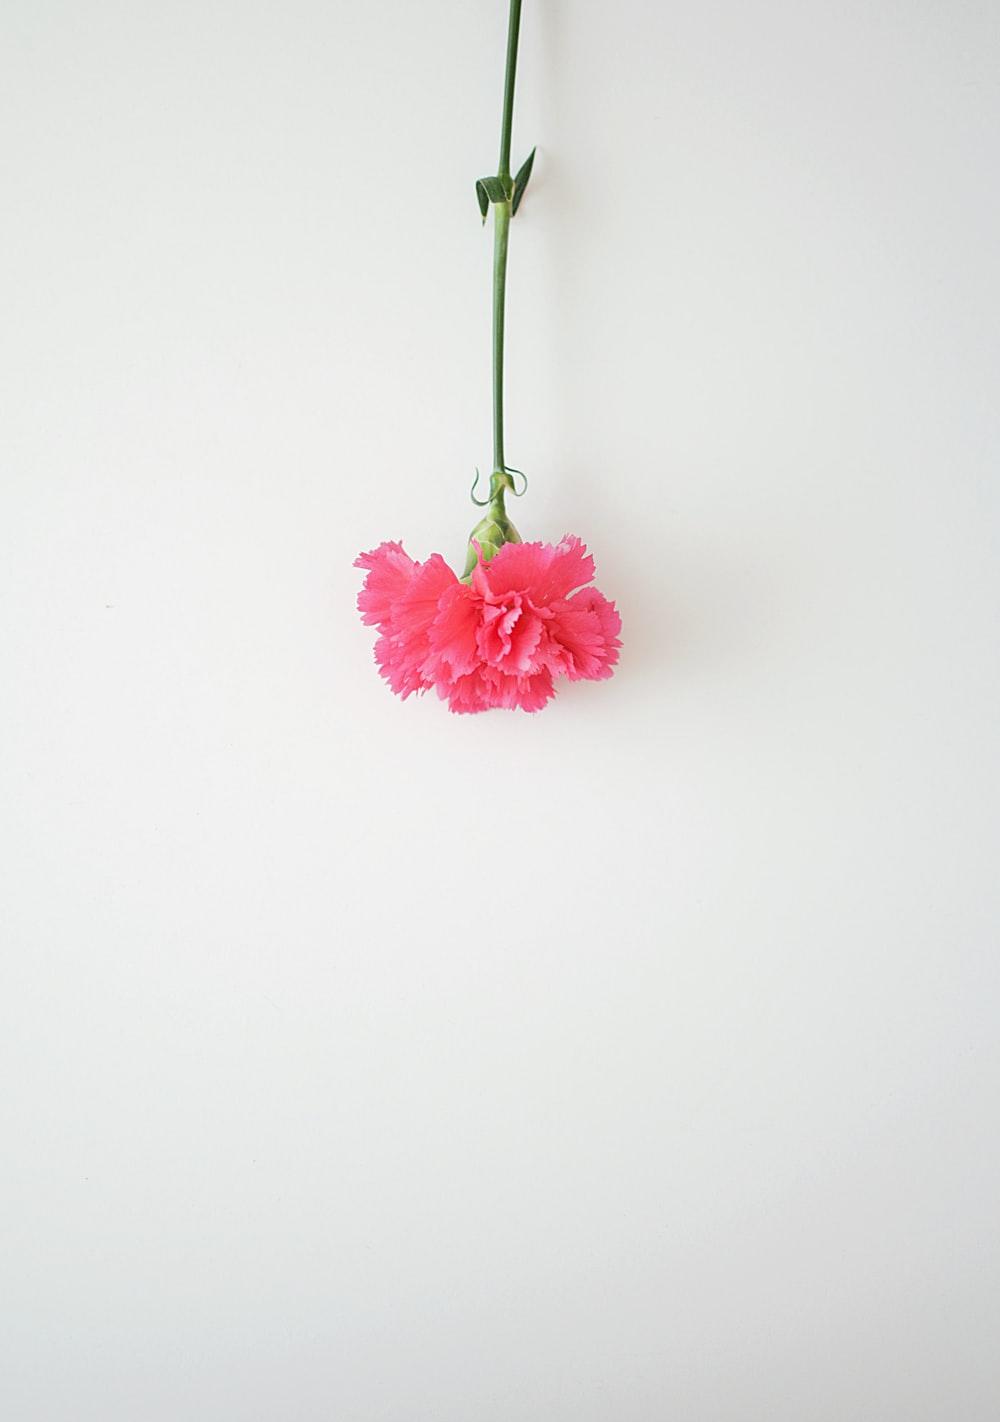 Pink Carnation Pictures Download Images on Unsplash 1000x1422